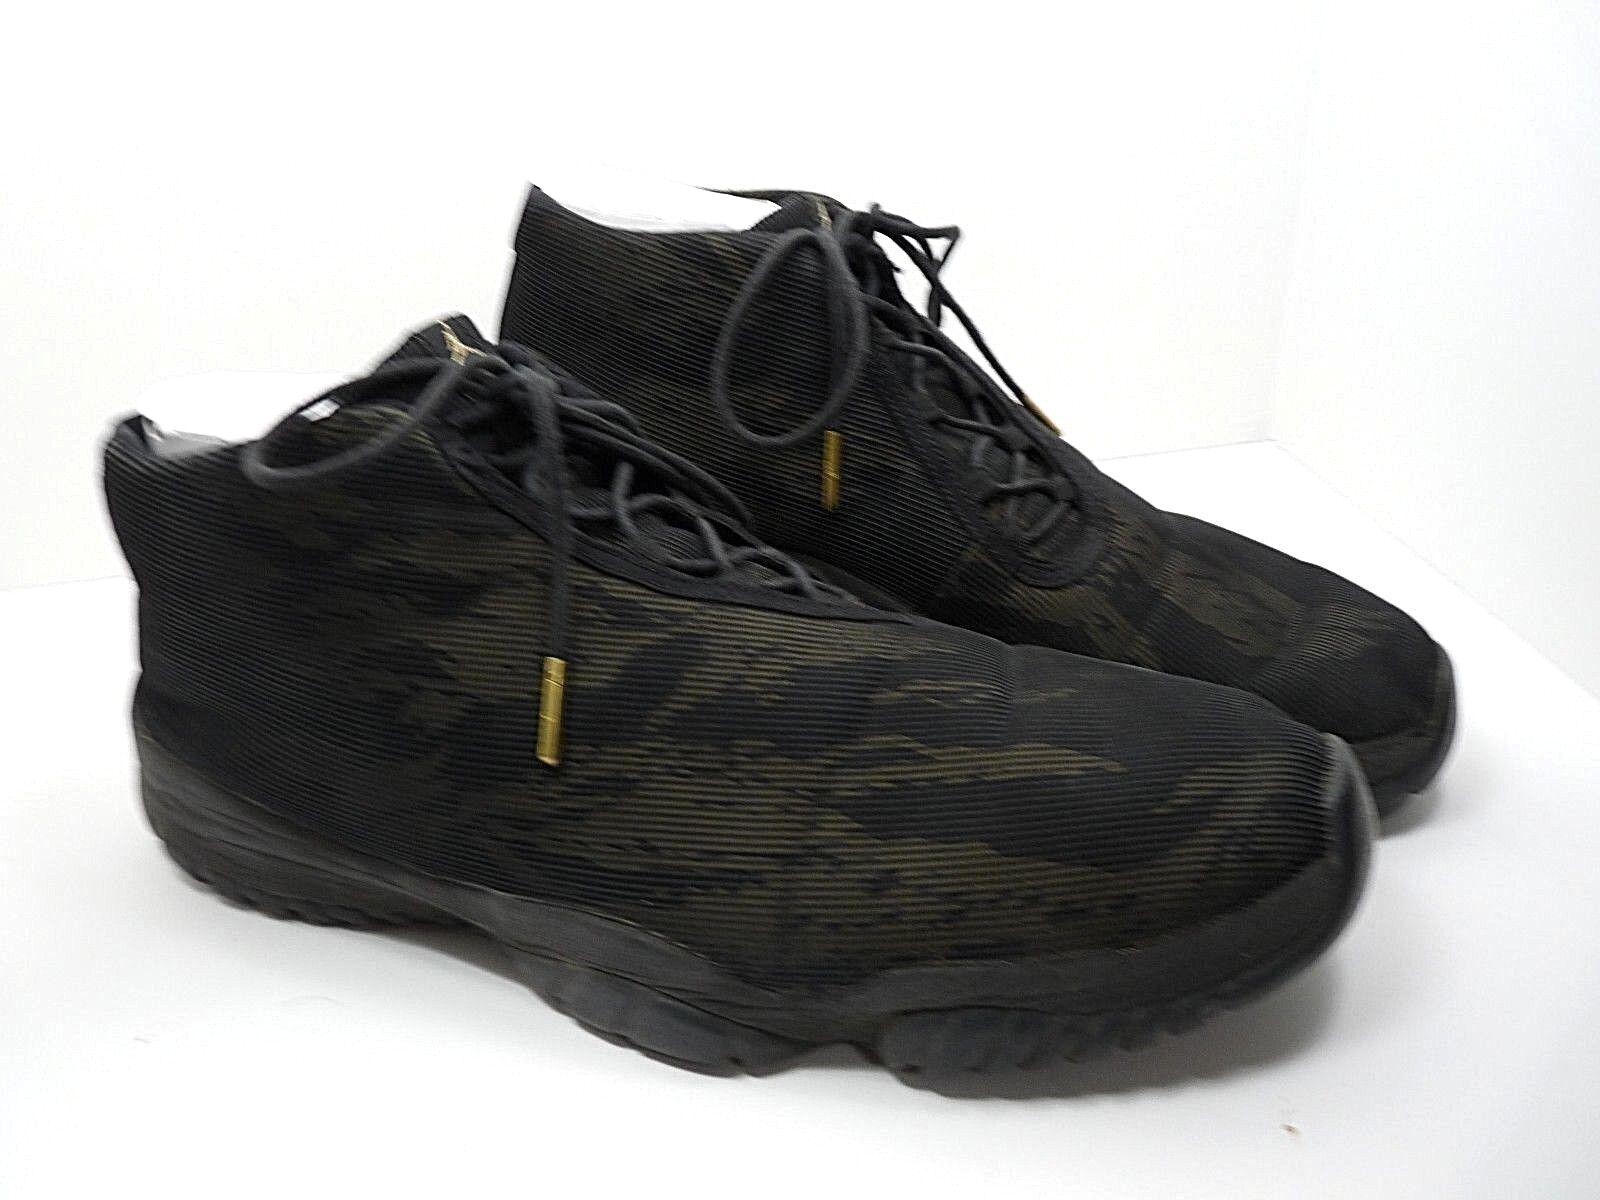 Nike Air Jordan Future Black Metallic Gold Tiger Camo 656503 035 Sz 14 Euro 48.5 Great discount